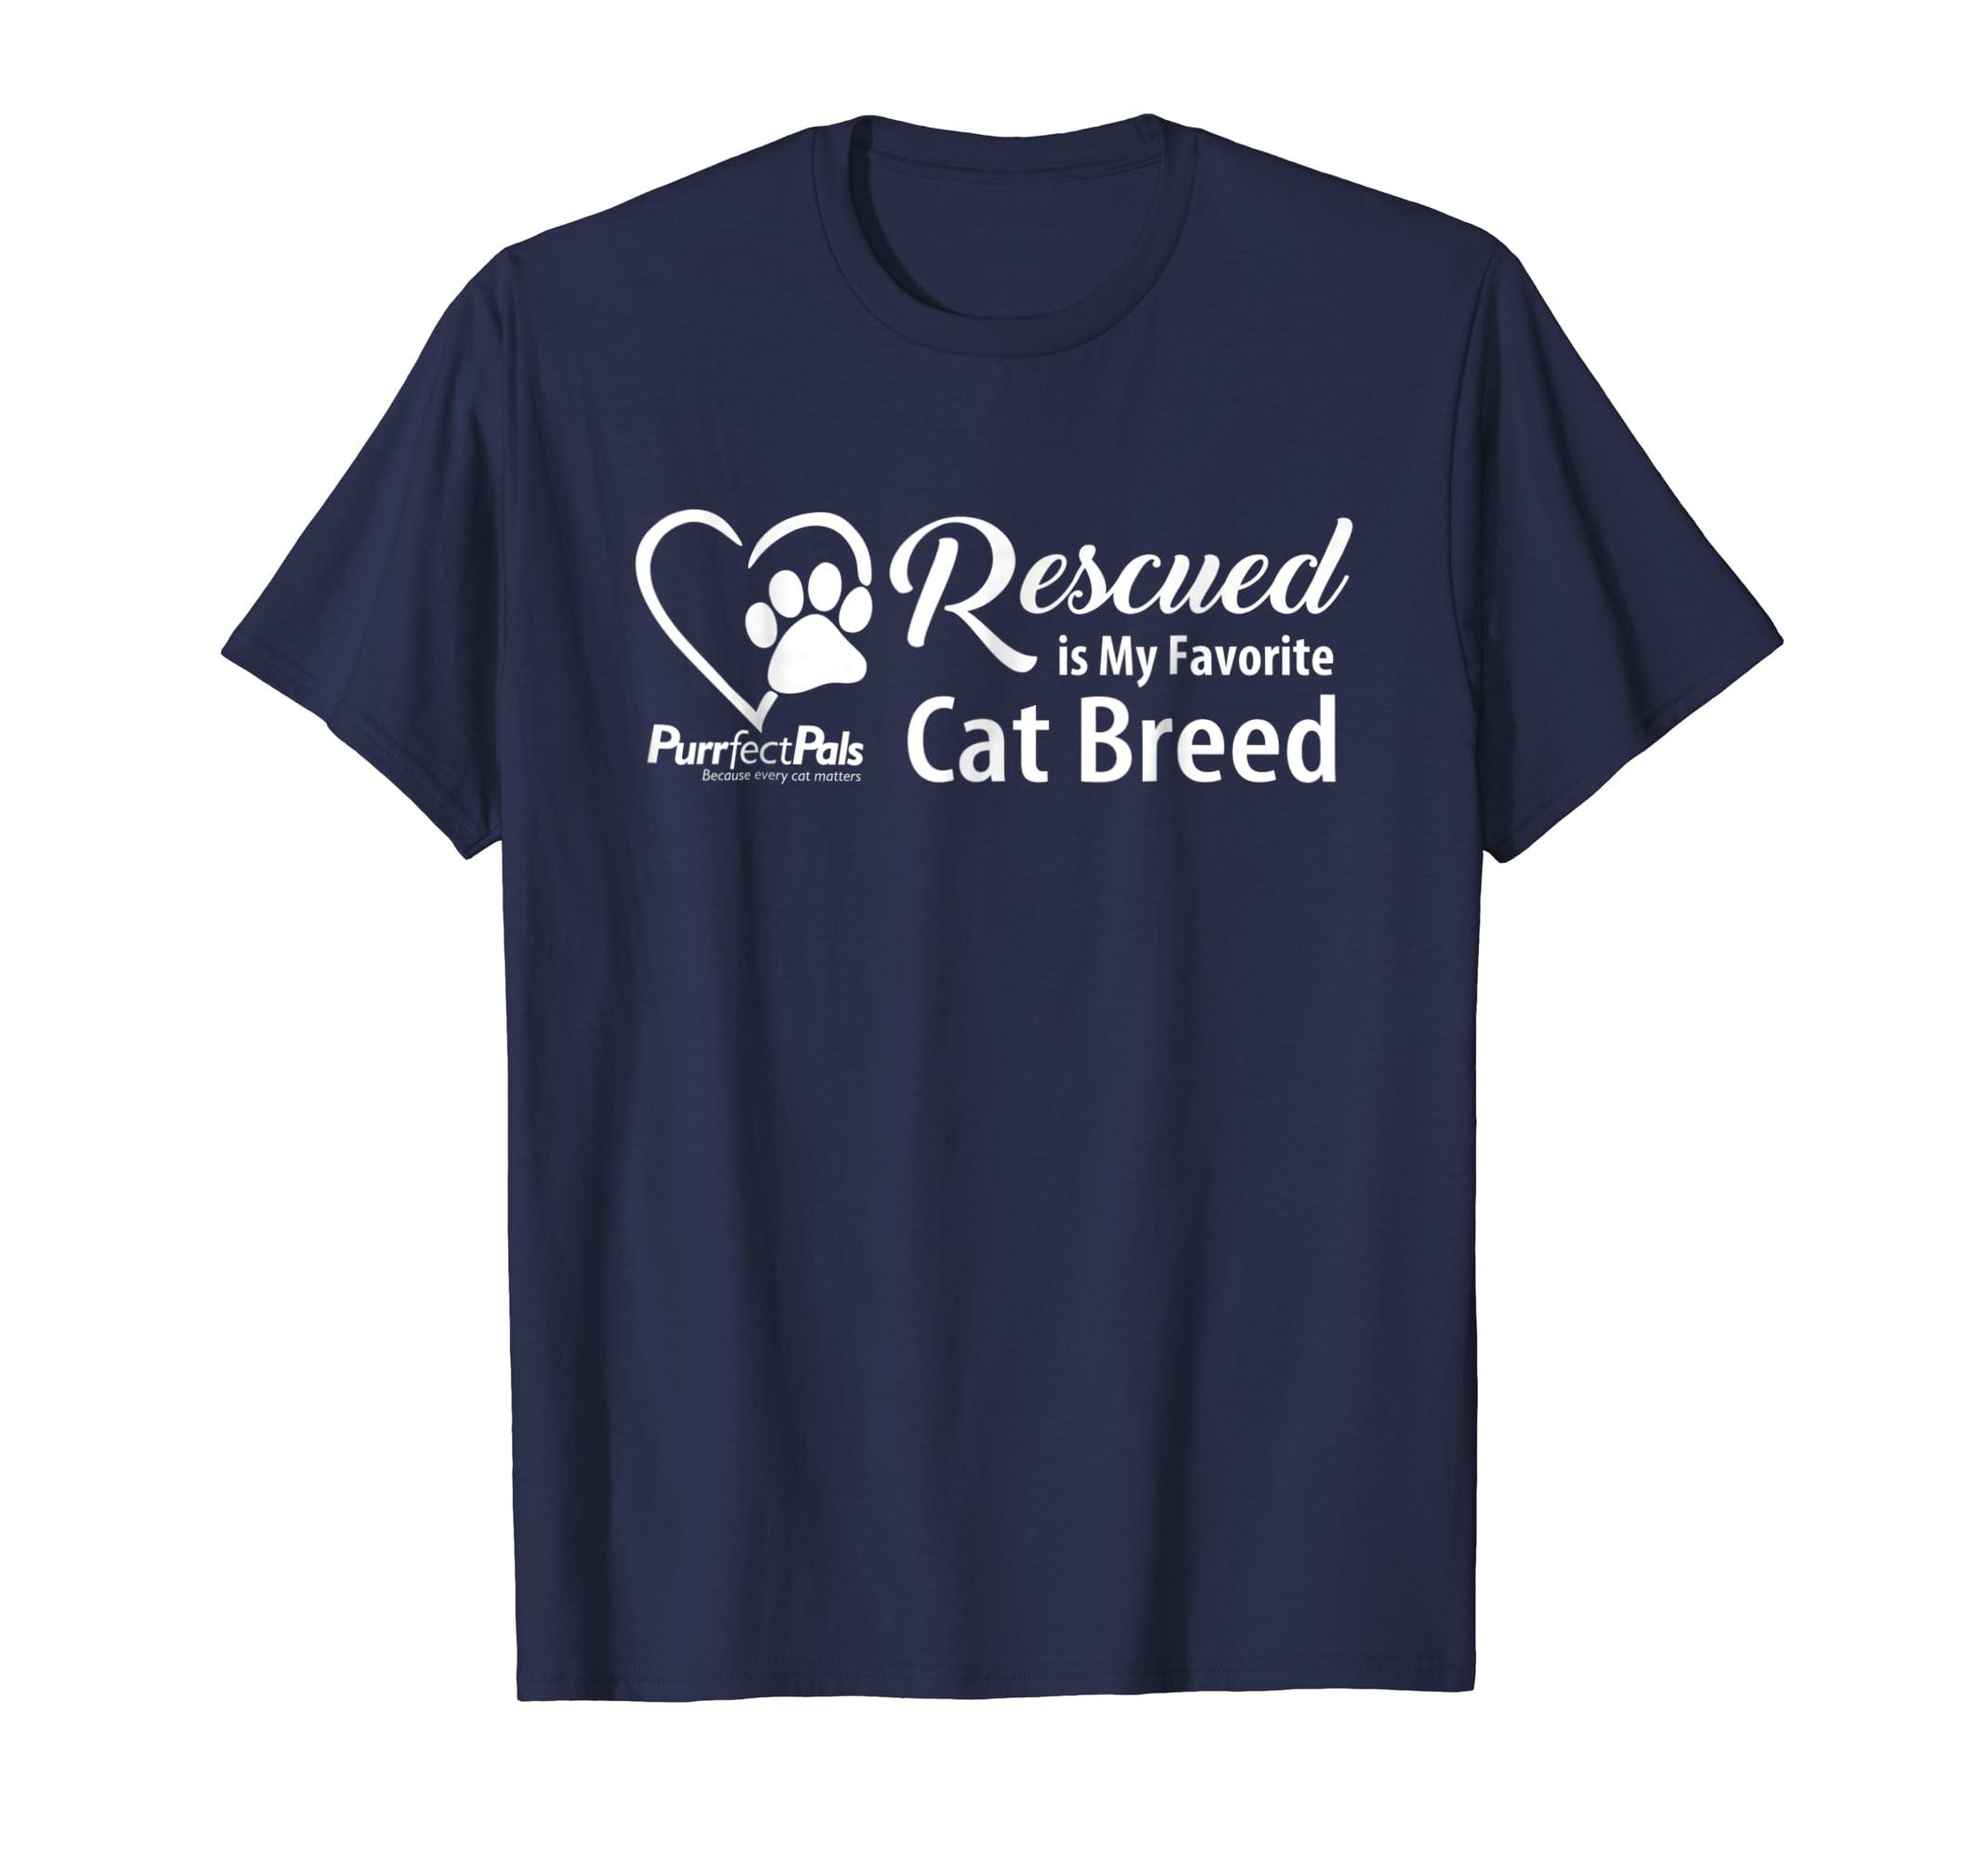 Animal Rescue T-Shirt: